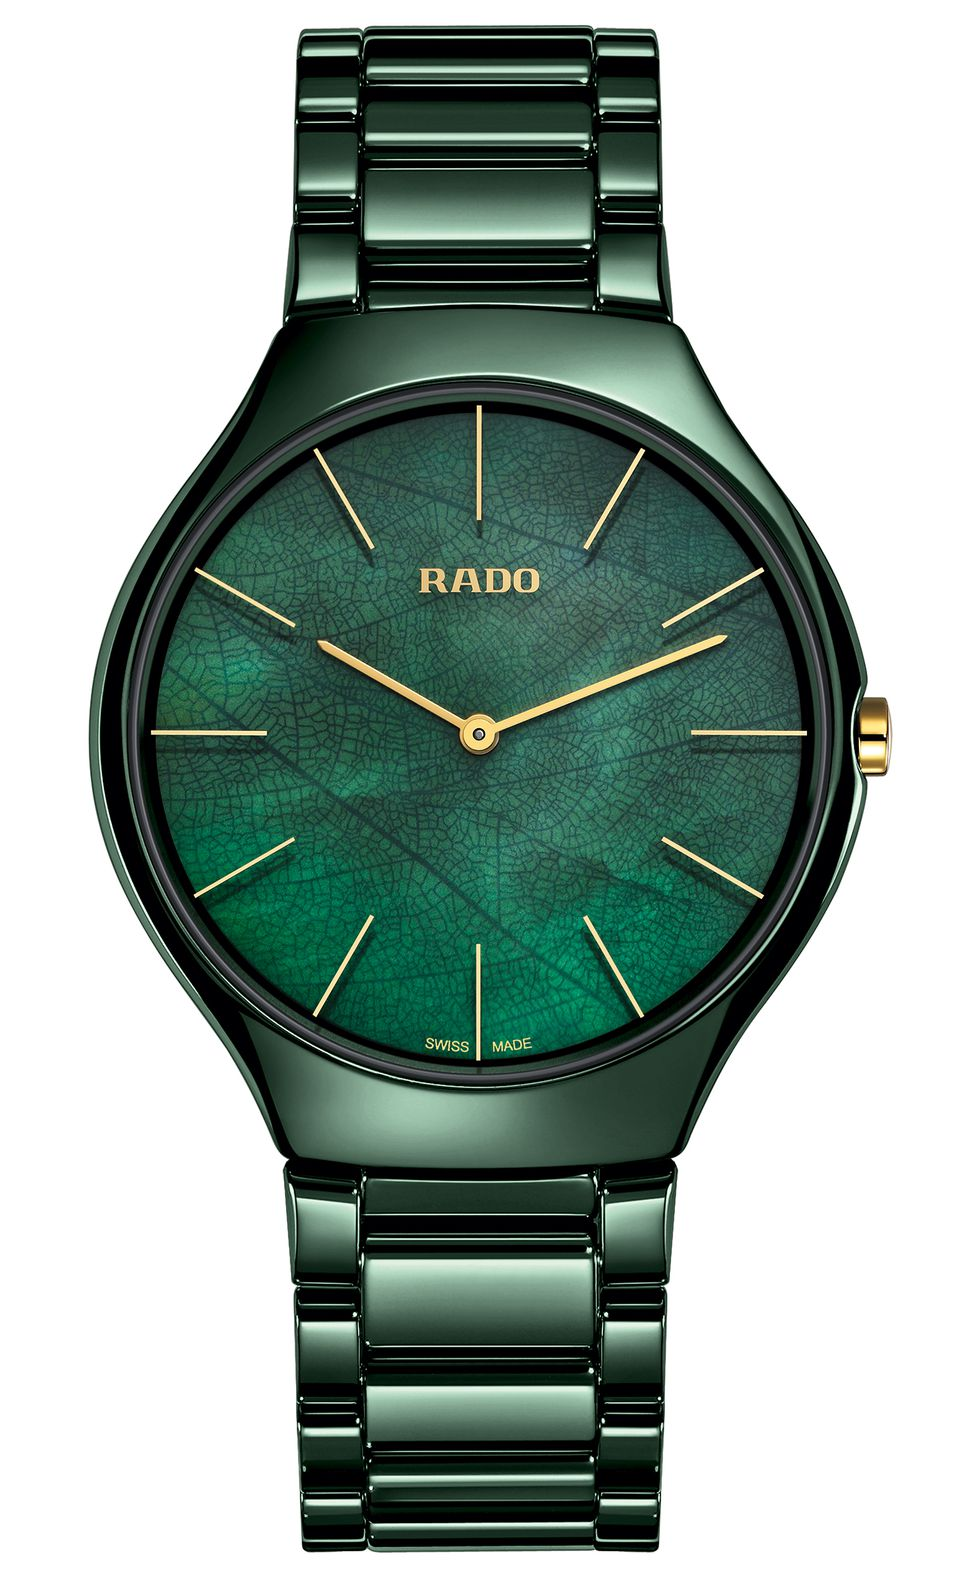 f1911370e تم استلهام مجموعة True Thinline Nature من رادو من خلال شراكة صانع الساعات  مع غراندي جيارديني إيطالياني ، وهي جمعية تضم شركات الرئيسية في إيطاليا  ومالطا .